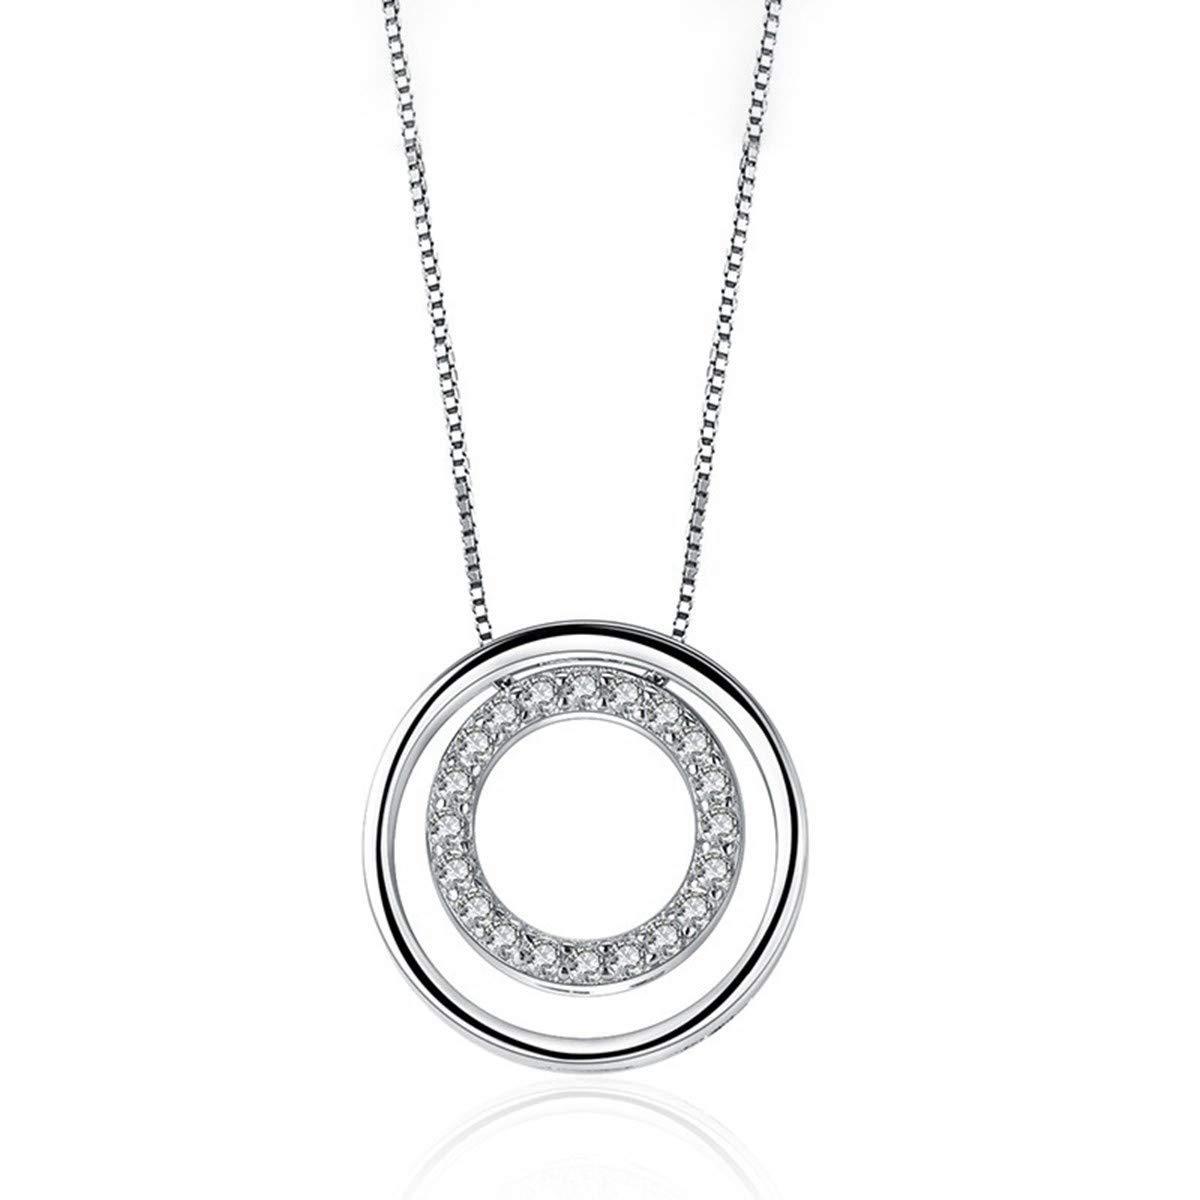 Liancie Pendant Cubic Zirconia Concentric Sterling Silver Pendant Fashion Clavicle Chain